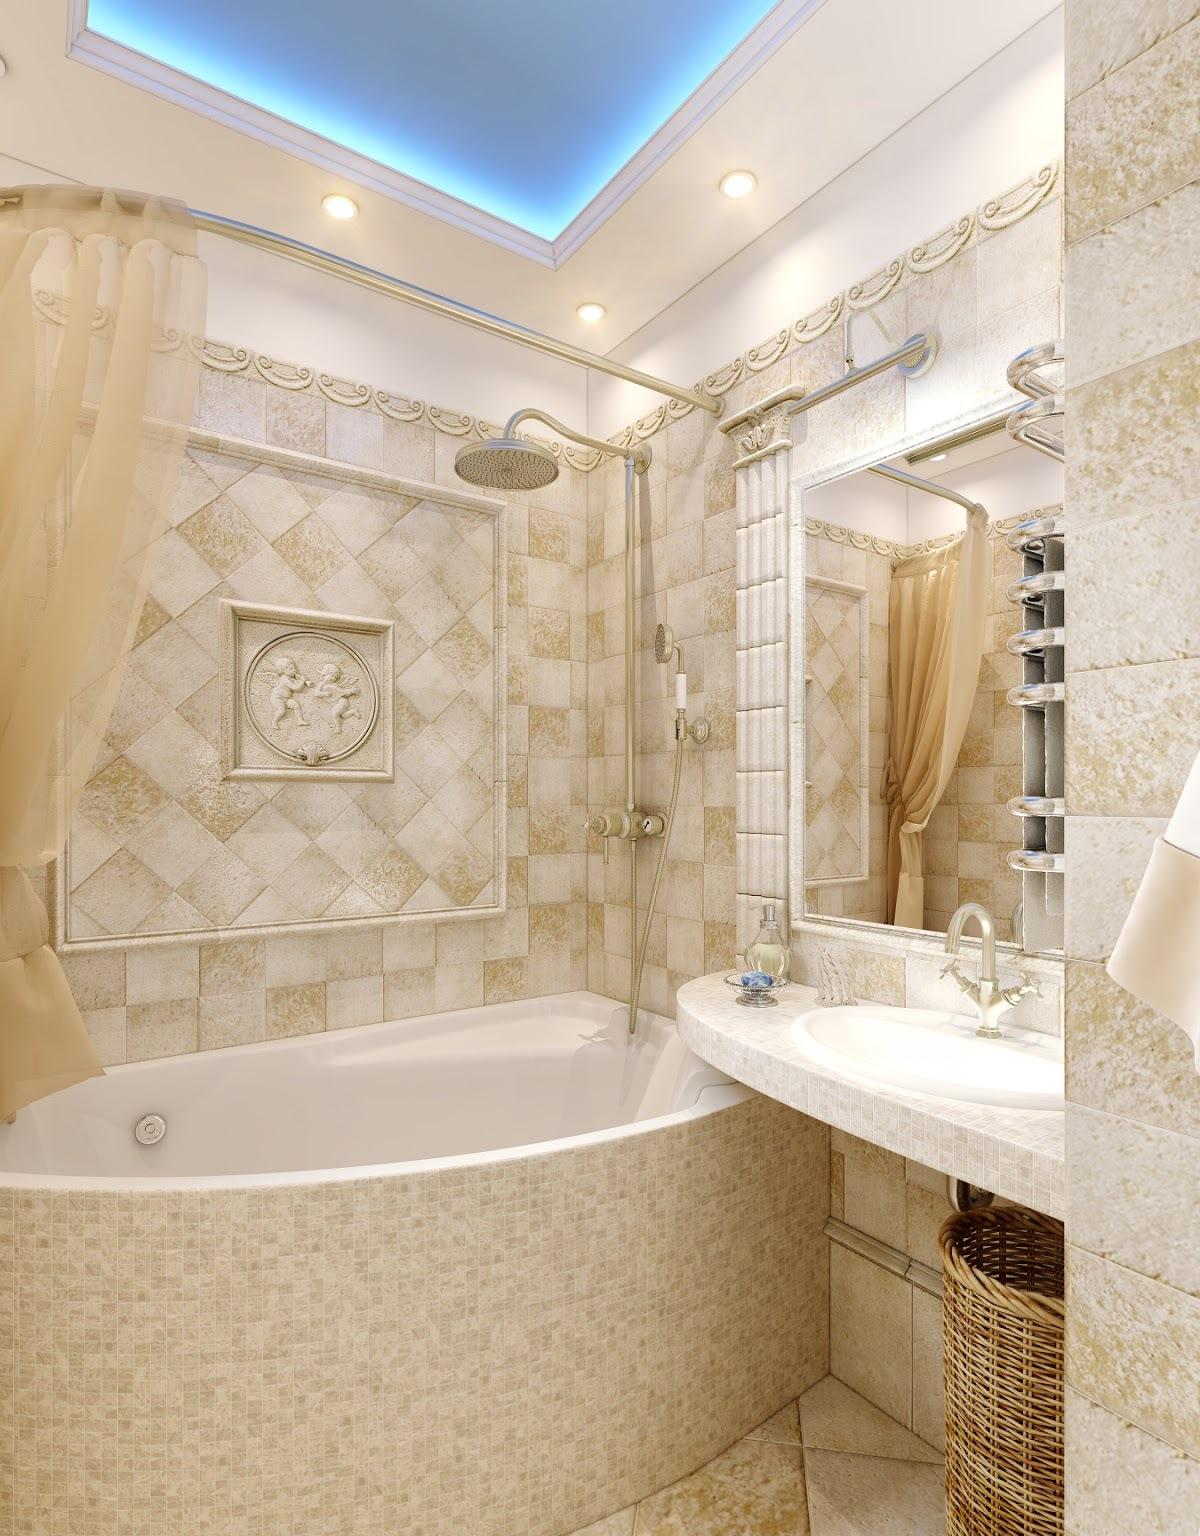 Ванная комната в бежевых тонах дизайн